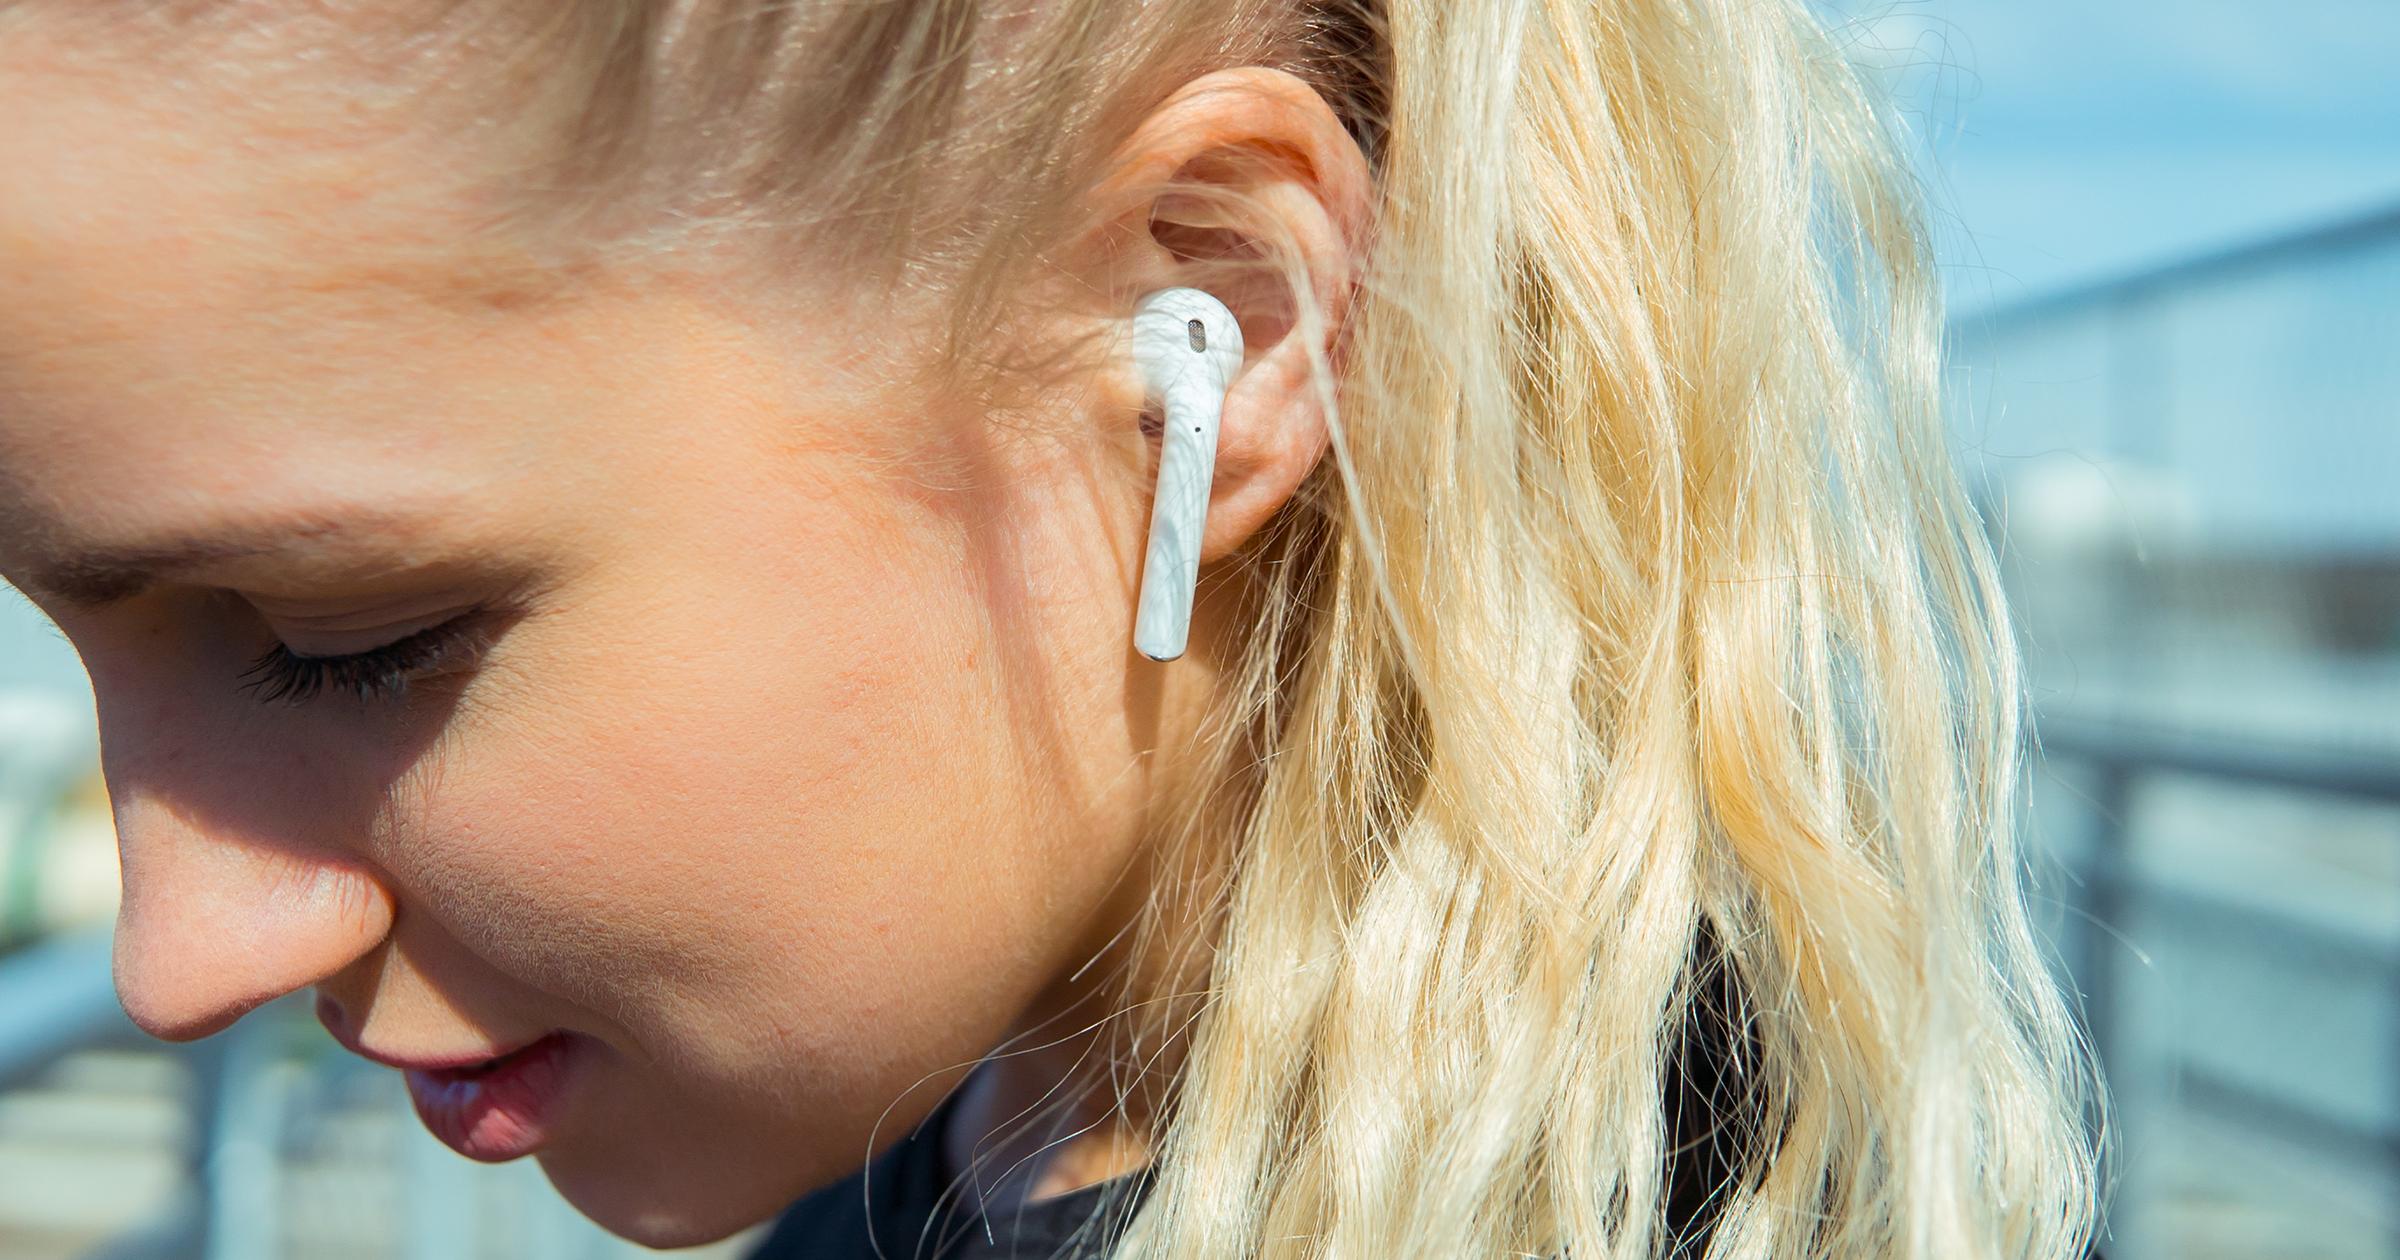 mobipunkt, airpods, handsfree, kõrvaklapid, juhtmeta kõrvaklapid, juhtmevabad kõrvaklapid